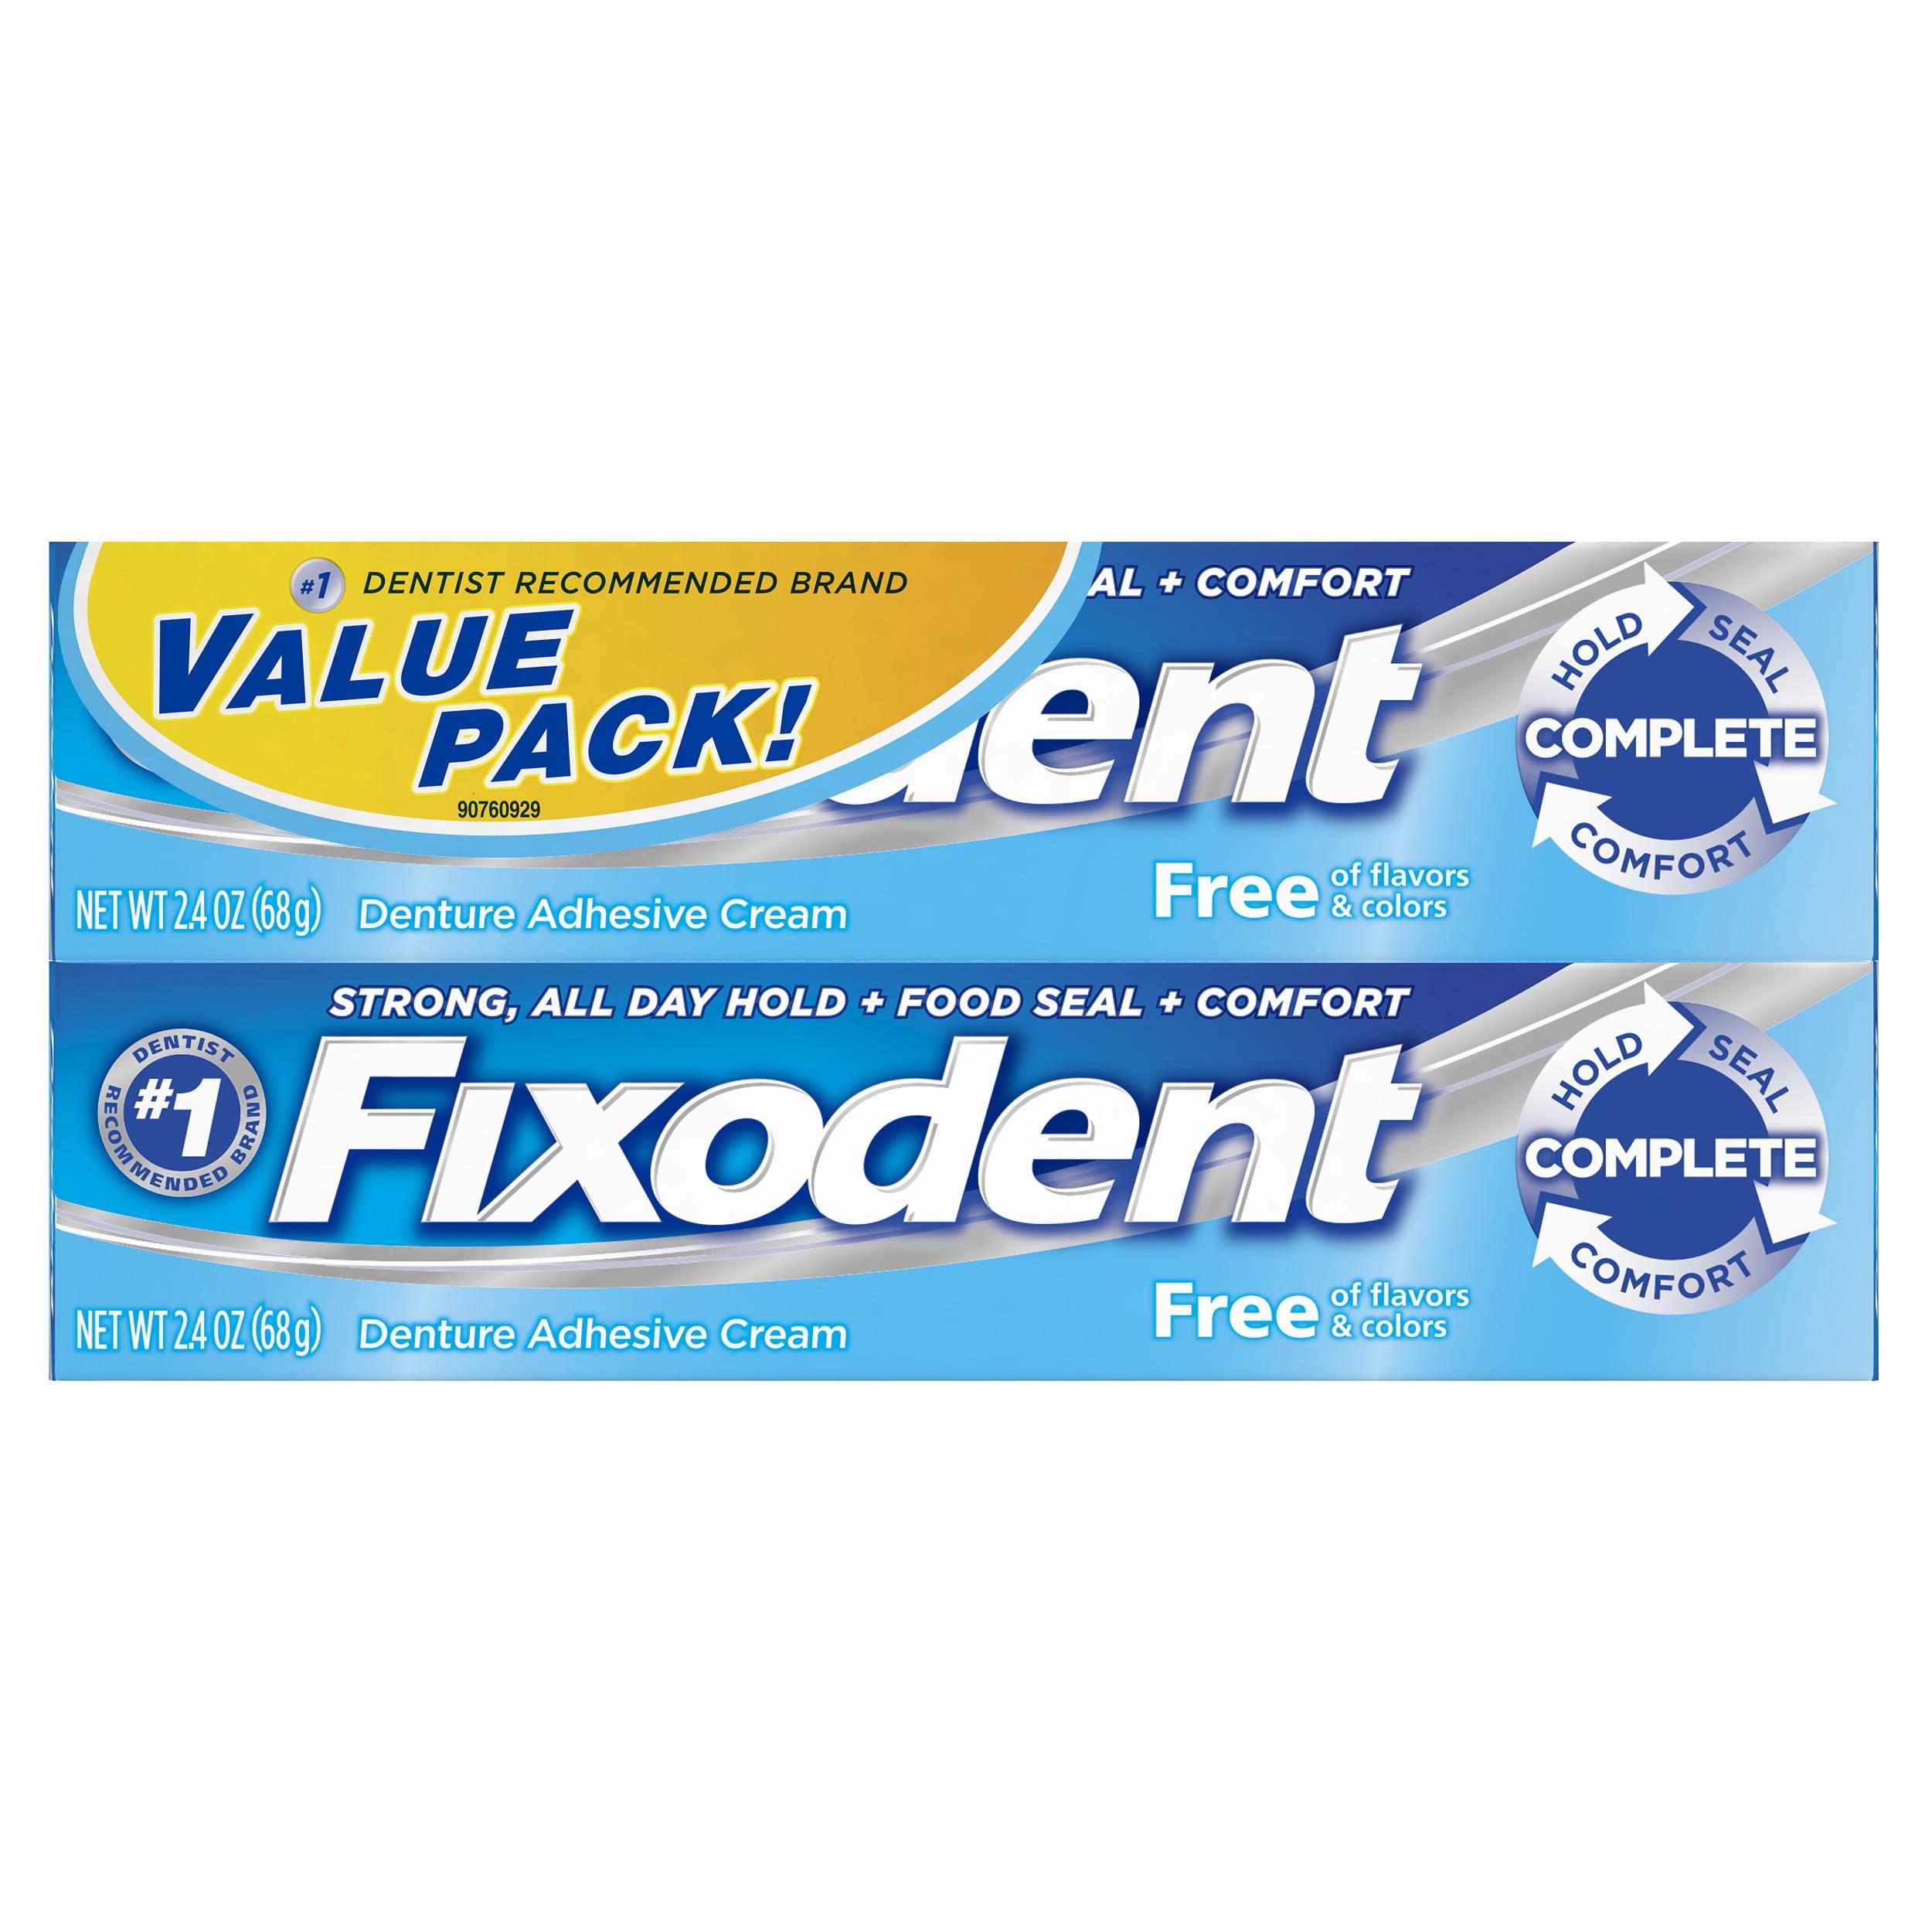 Fixodent Complete Free Denture Adhesive Cream, 2.4 oz TWIN